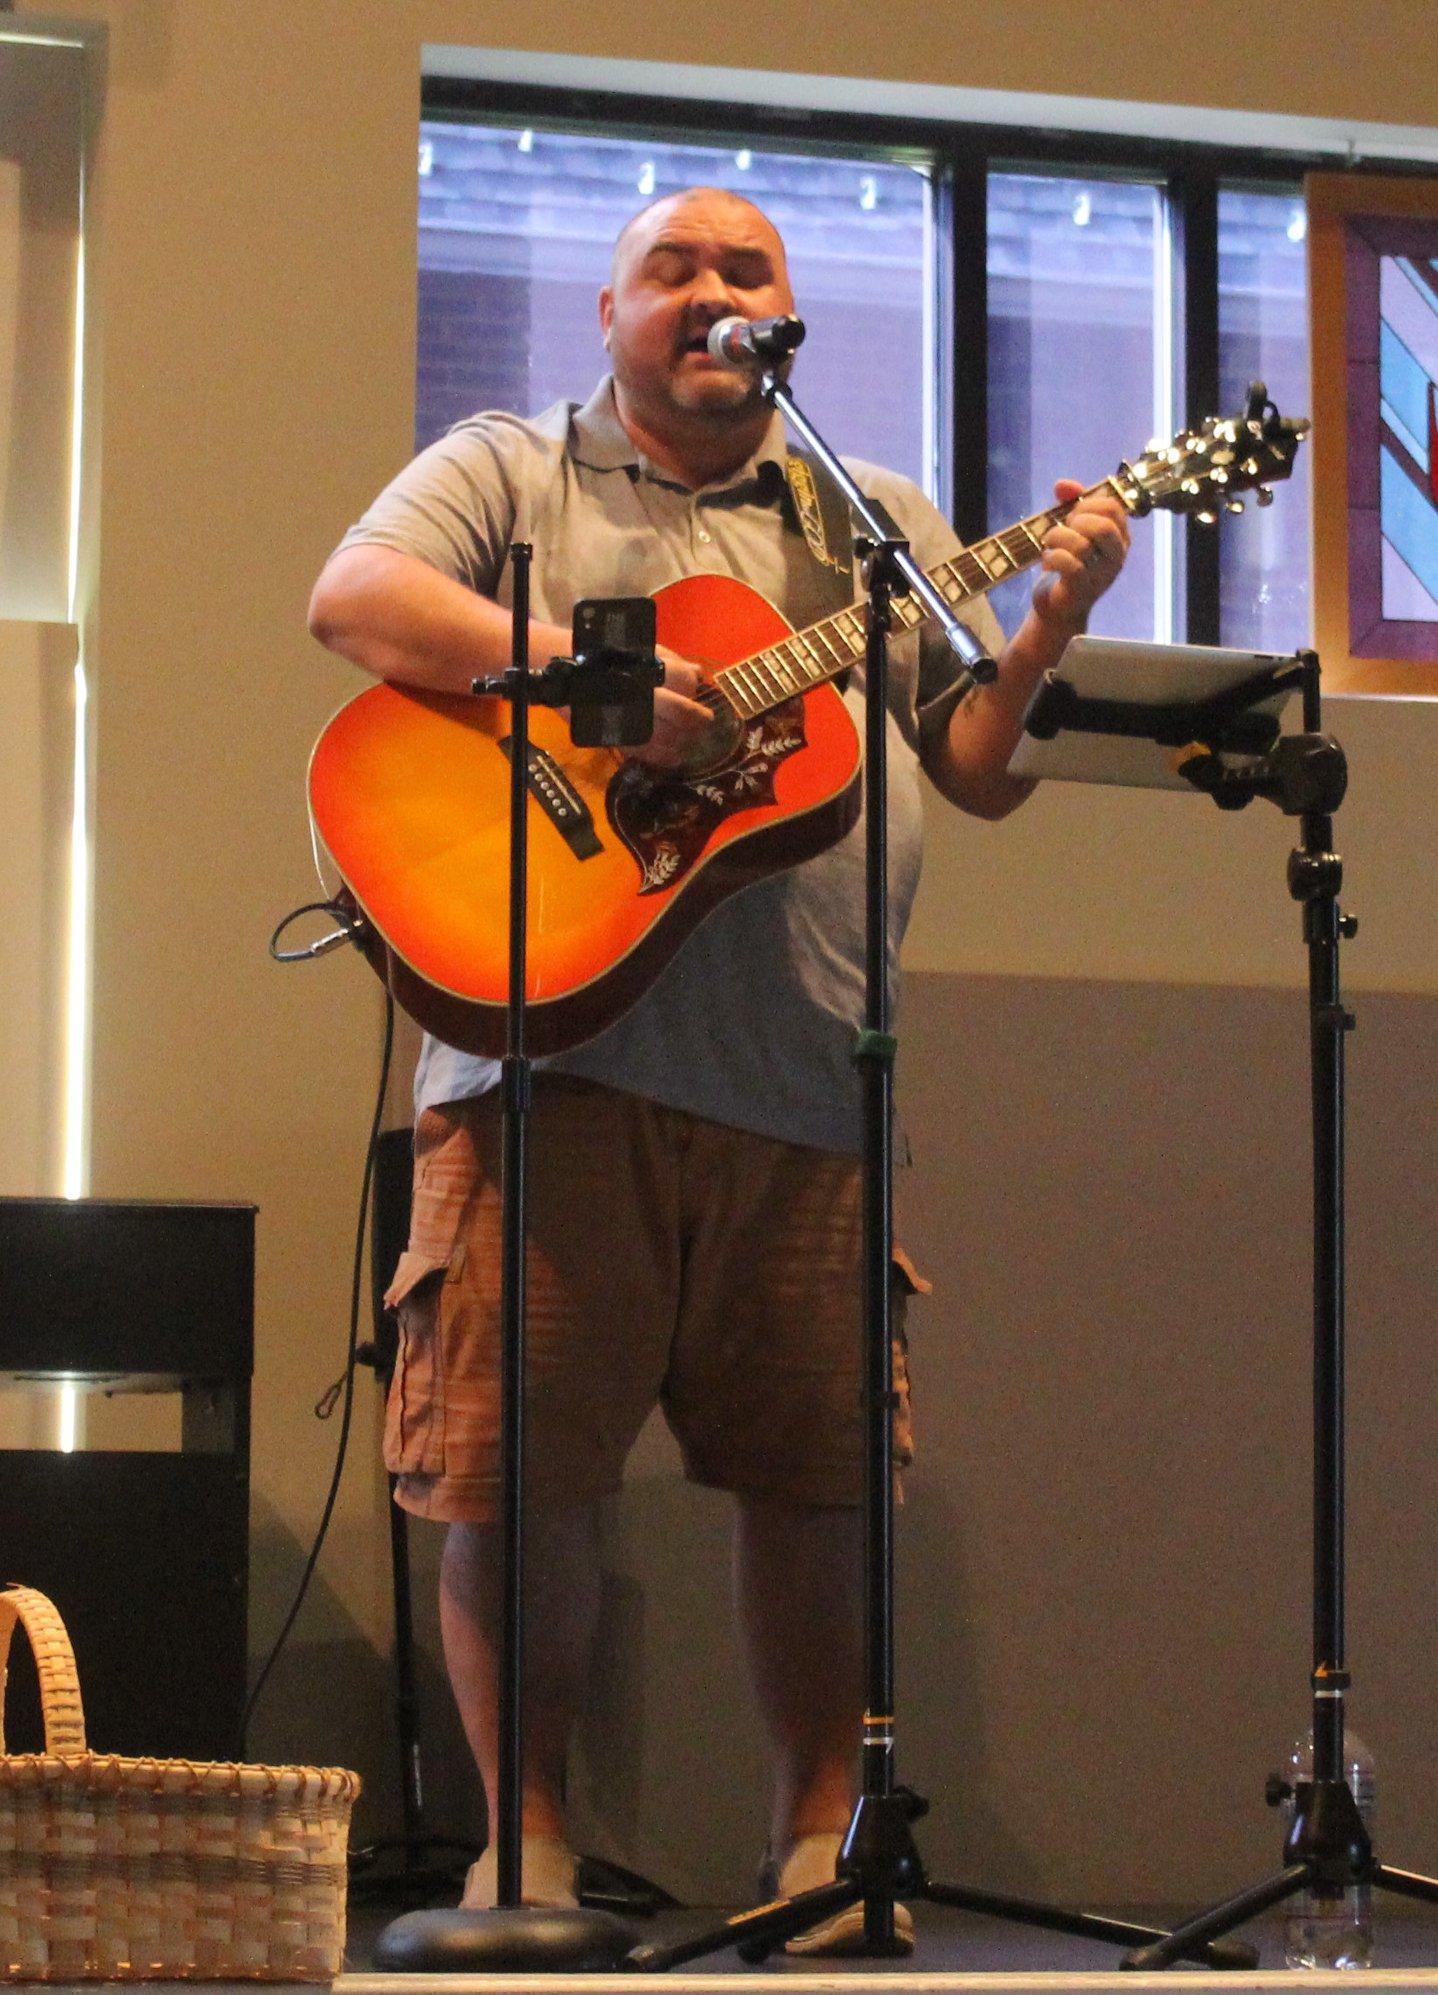 - Contemporary Worship Leader Matt Stratfordmattstratfordmusic1@gmail.com